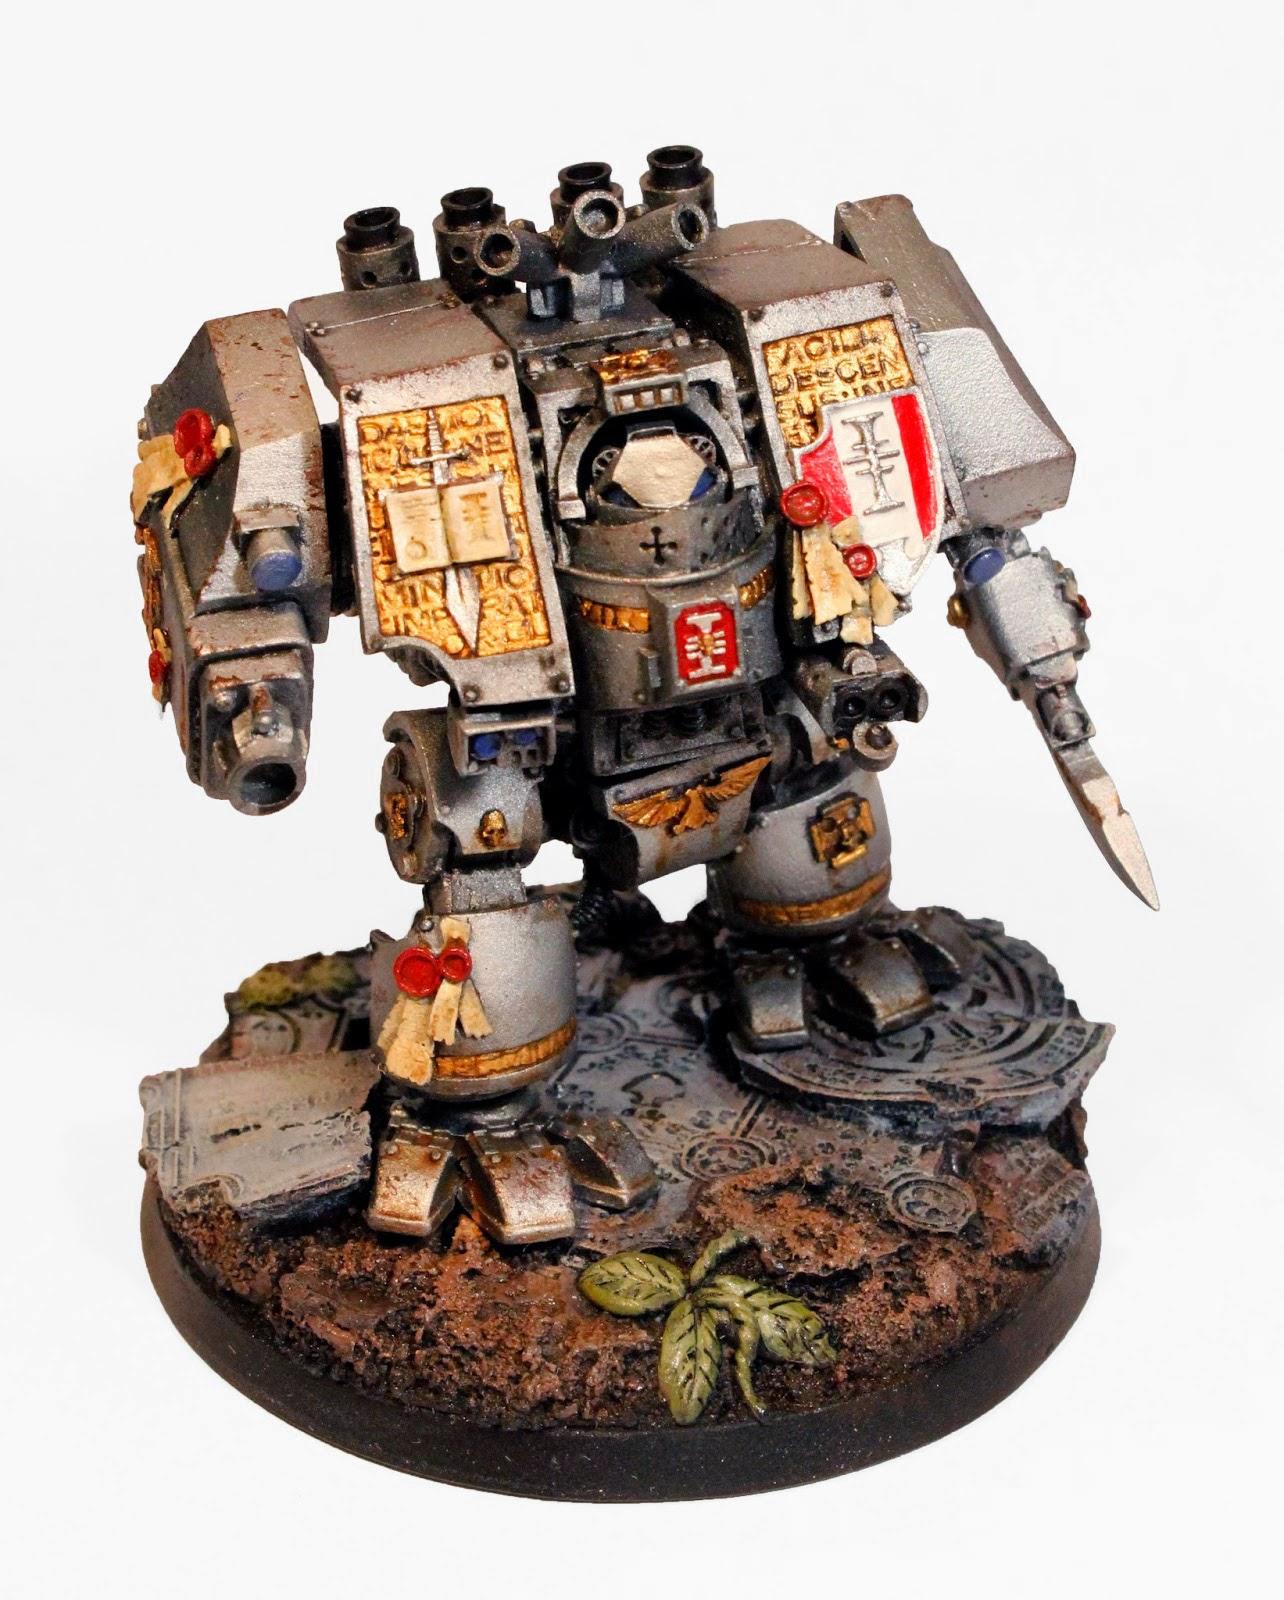 4 Knights of Gwyn picture WIP by tannen97 on DeviantArt